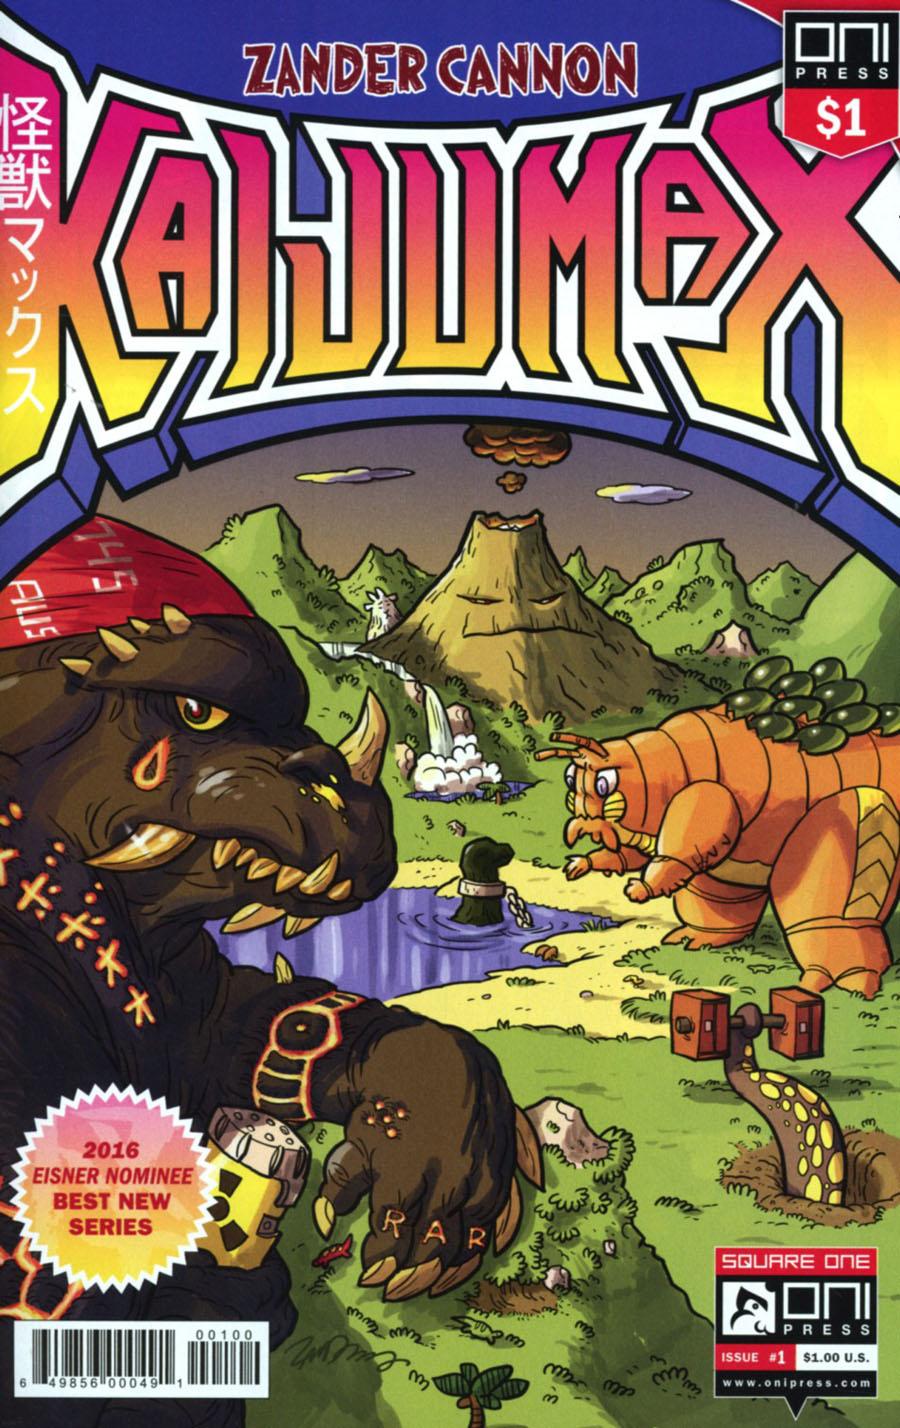 Kaijumax #1 Cover C 1 Dollar Edition